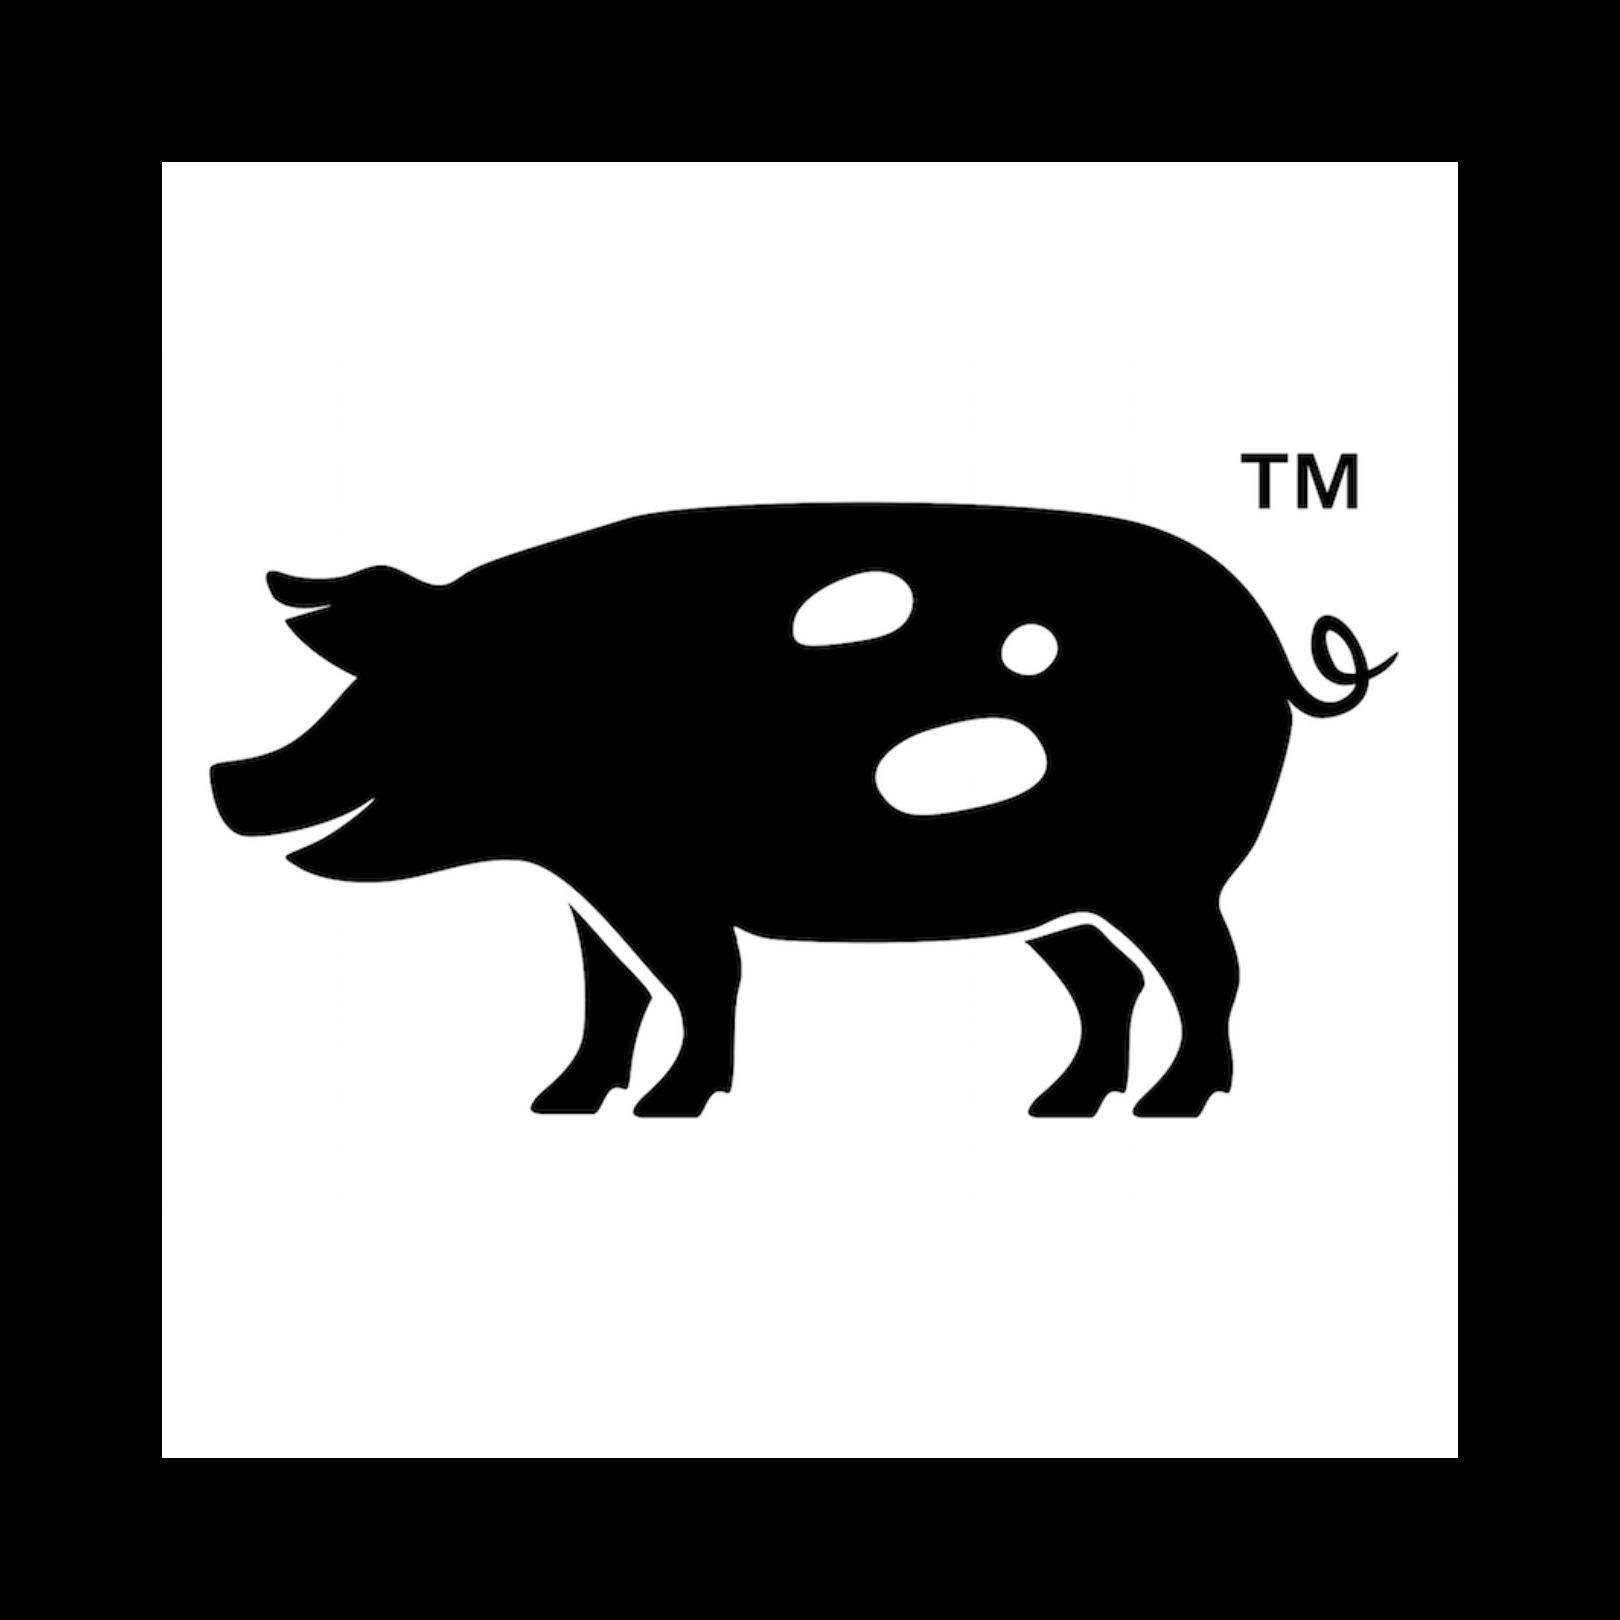 Boss Hog and the Duchess of Pork